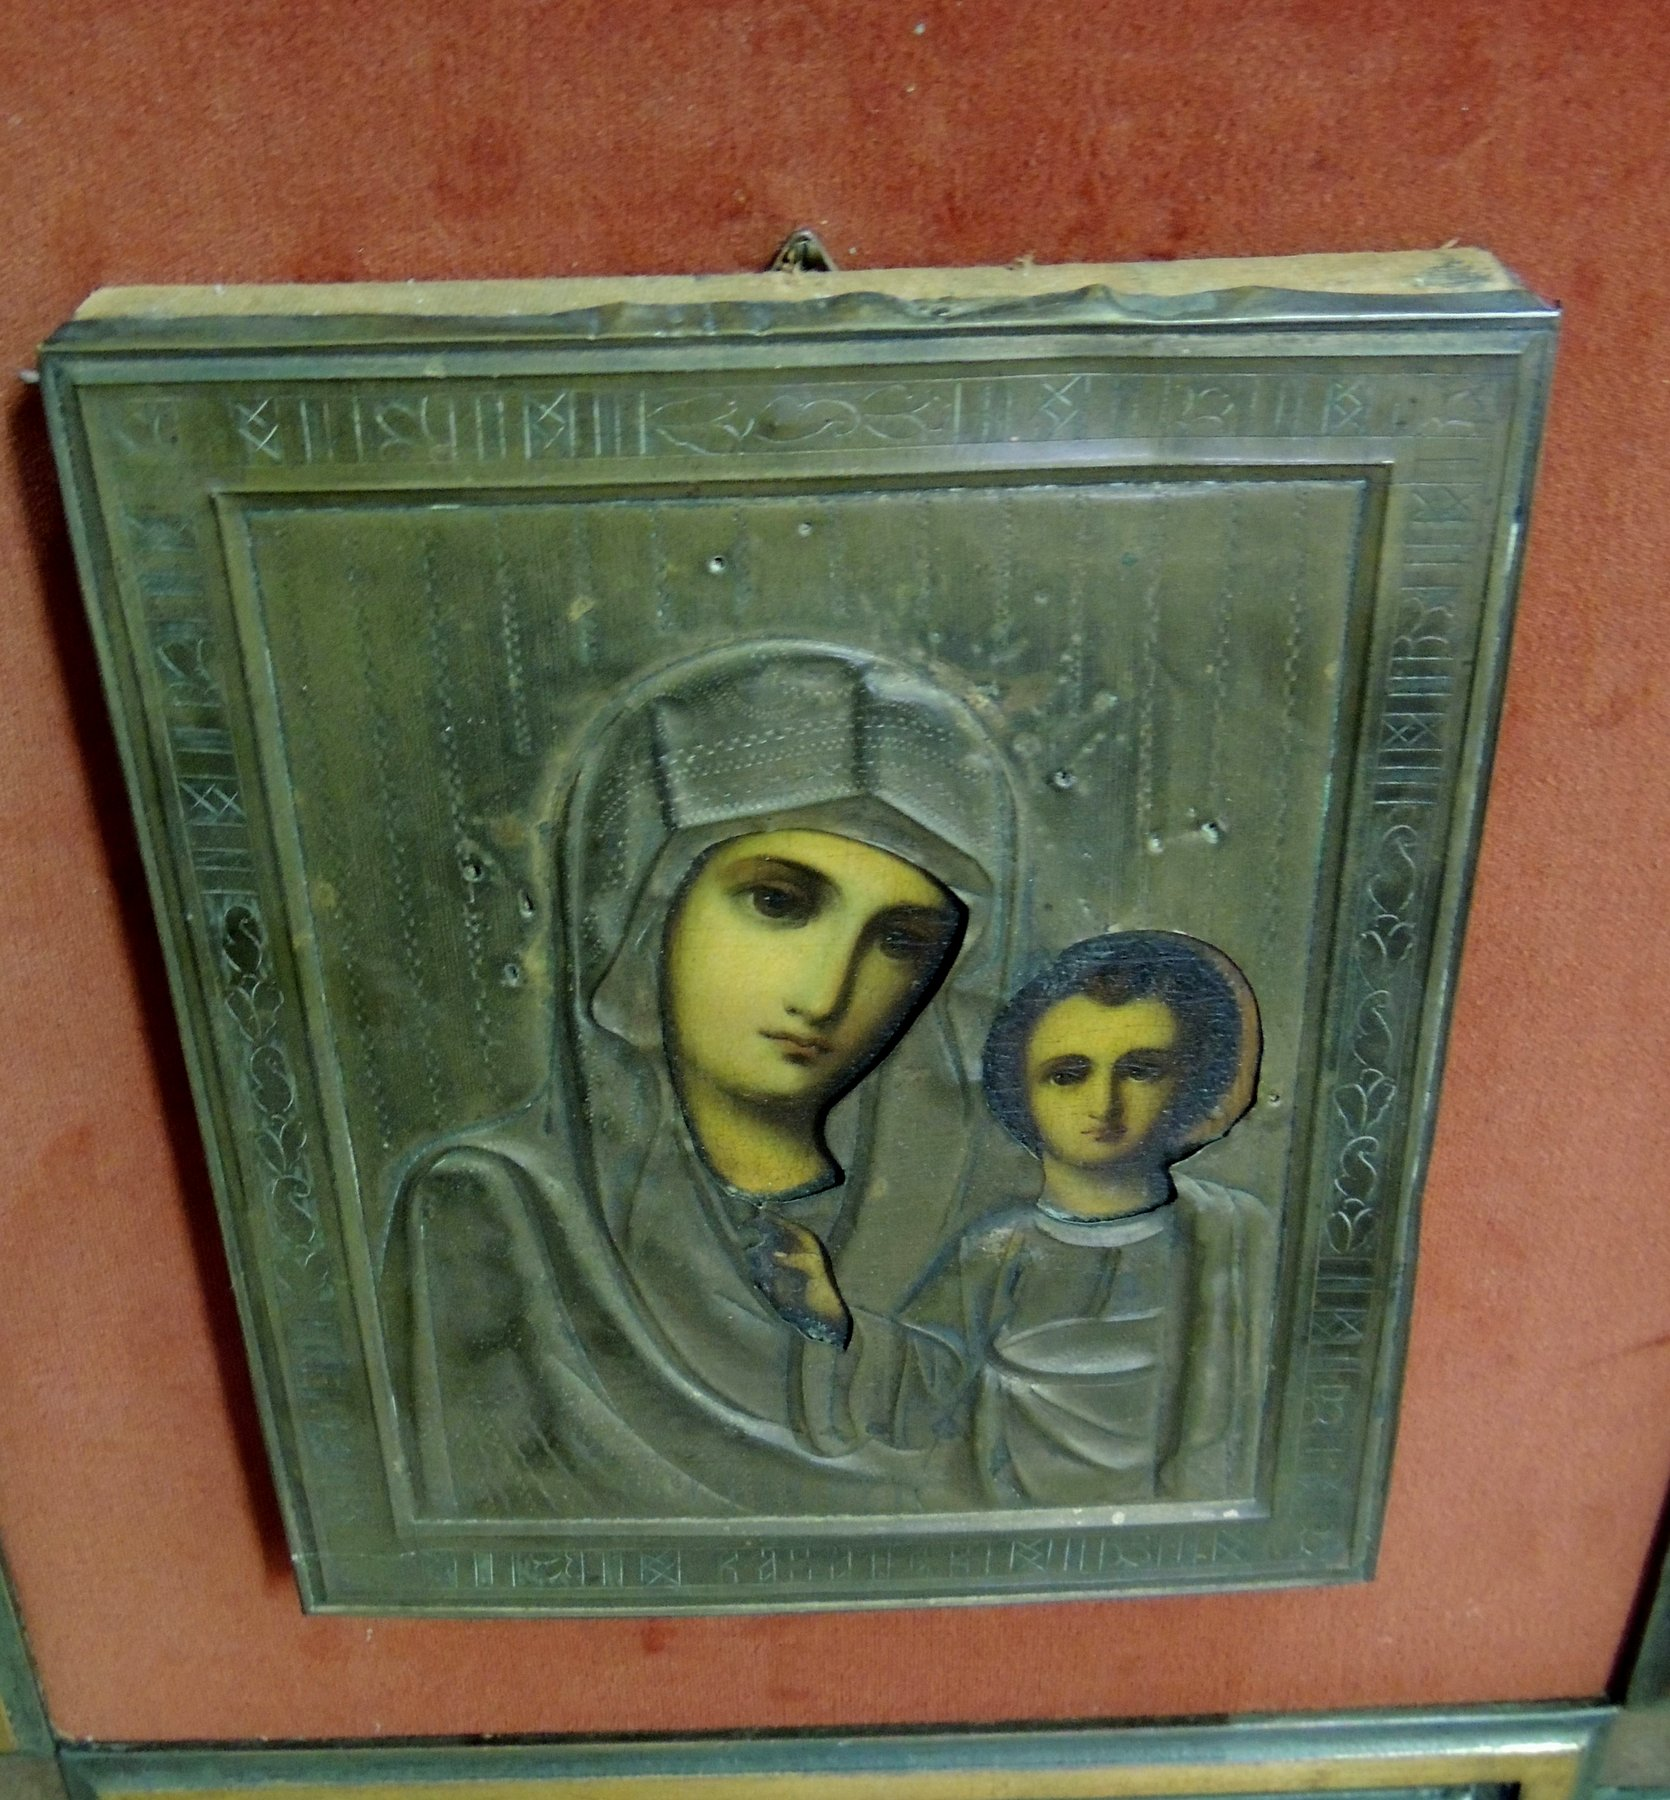 thumb5|icona con madonna cm 18 x 22,5